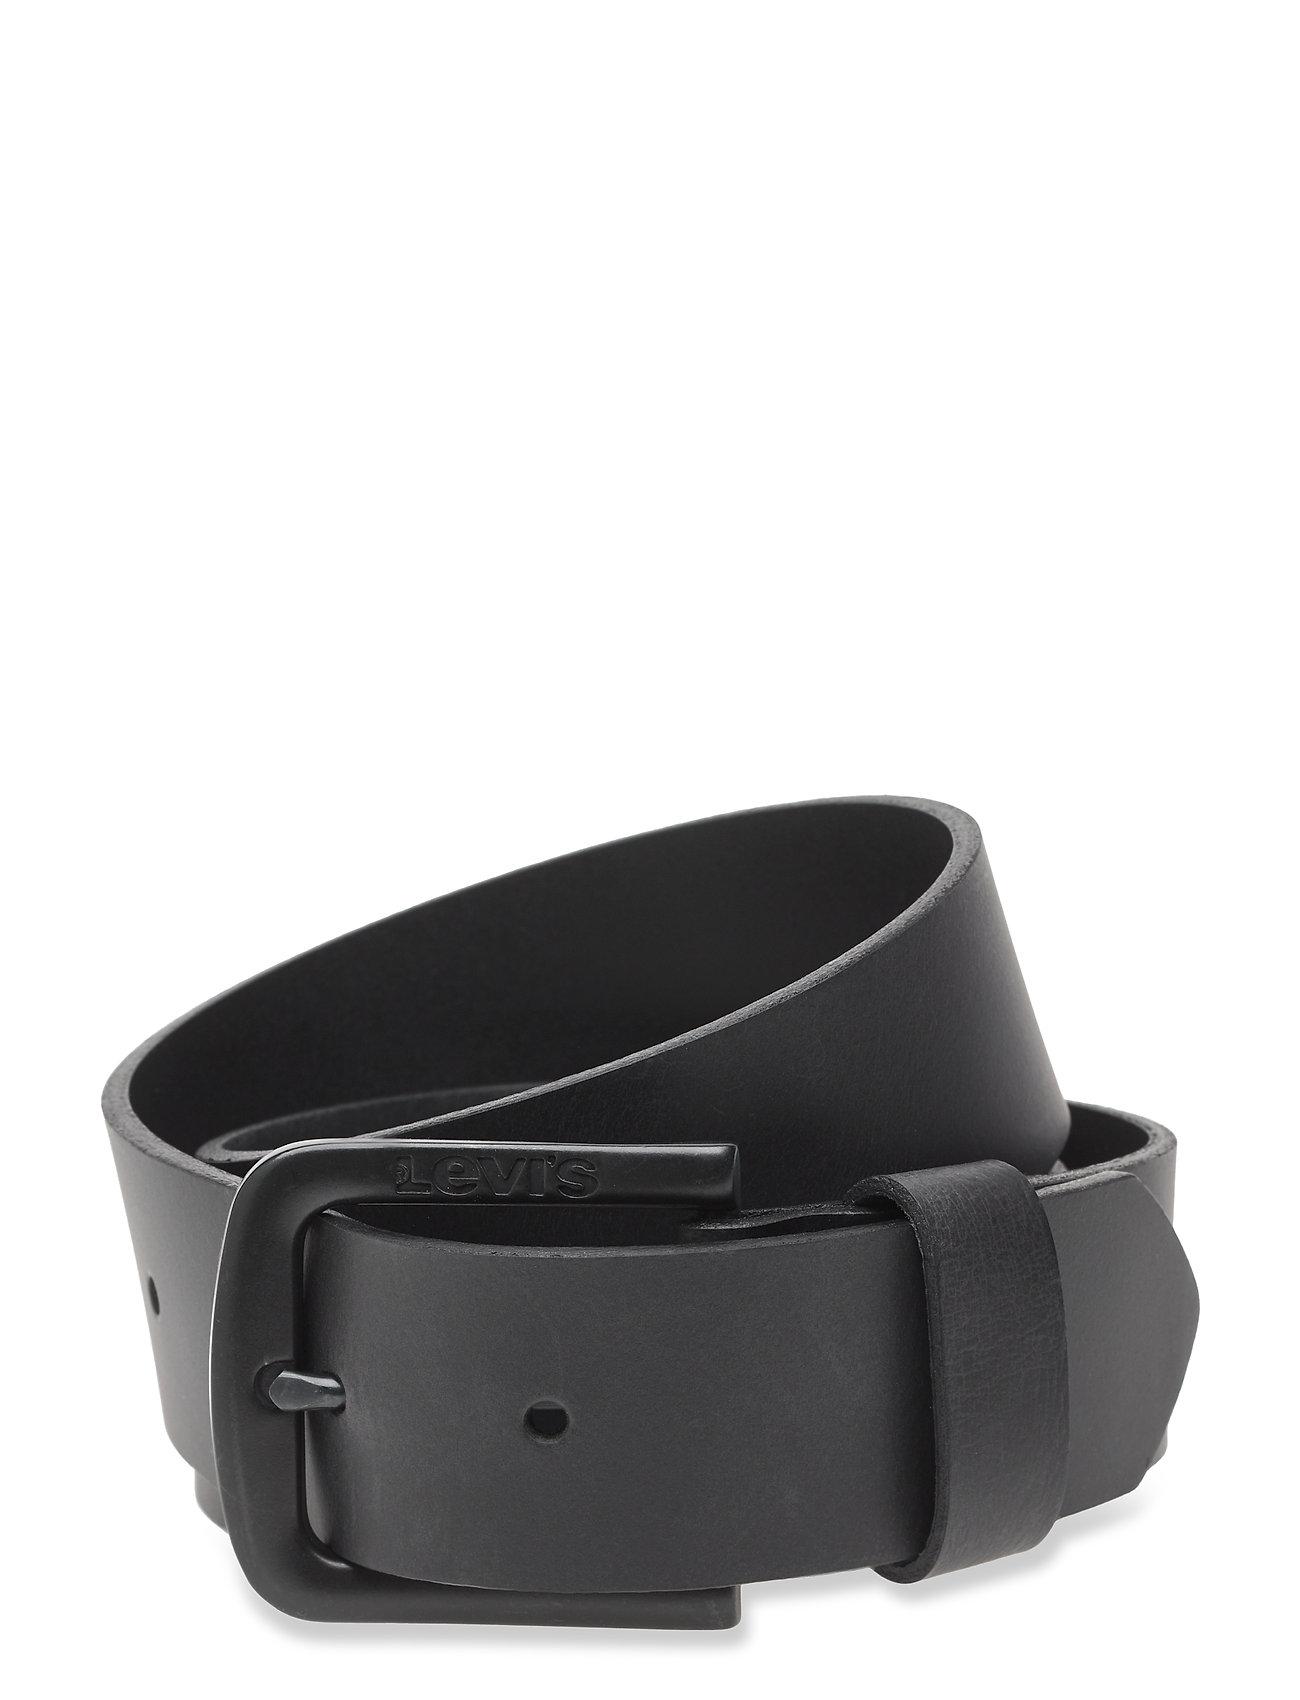 Levi's Footwear & Acc - SEINE METAL - ceintures classiques - regular black - 0